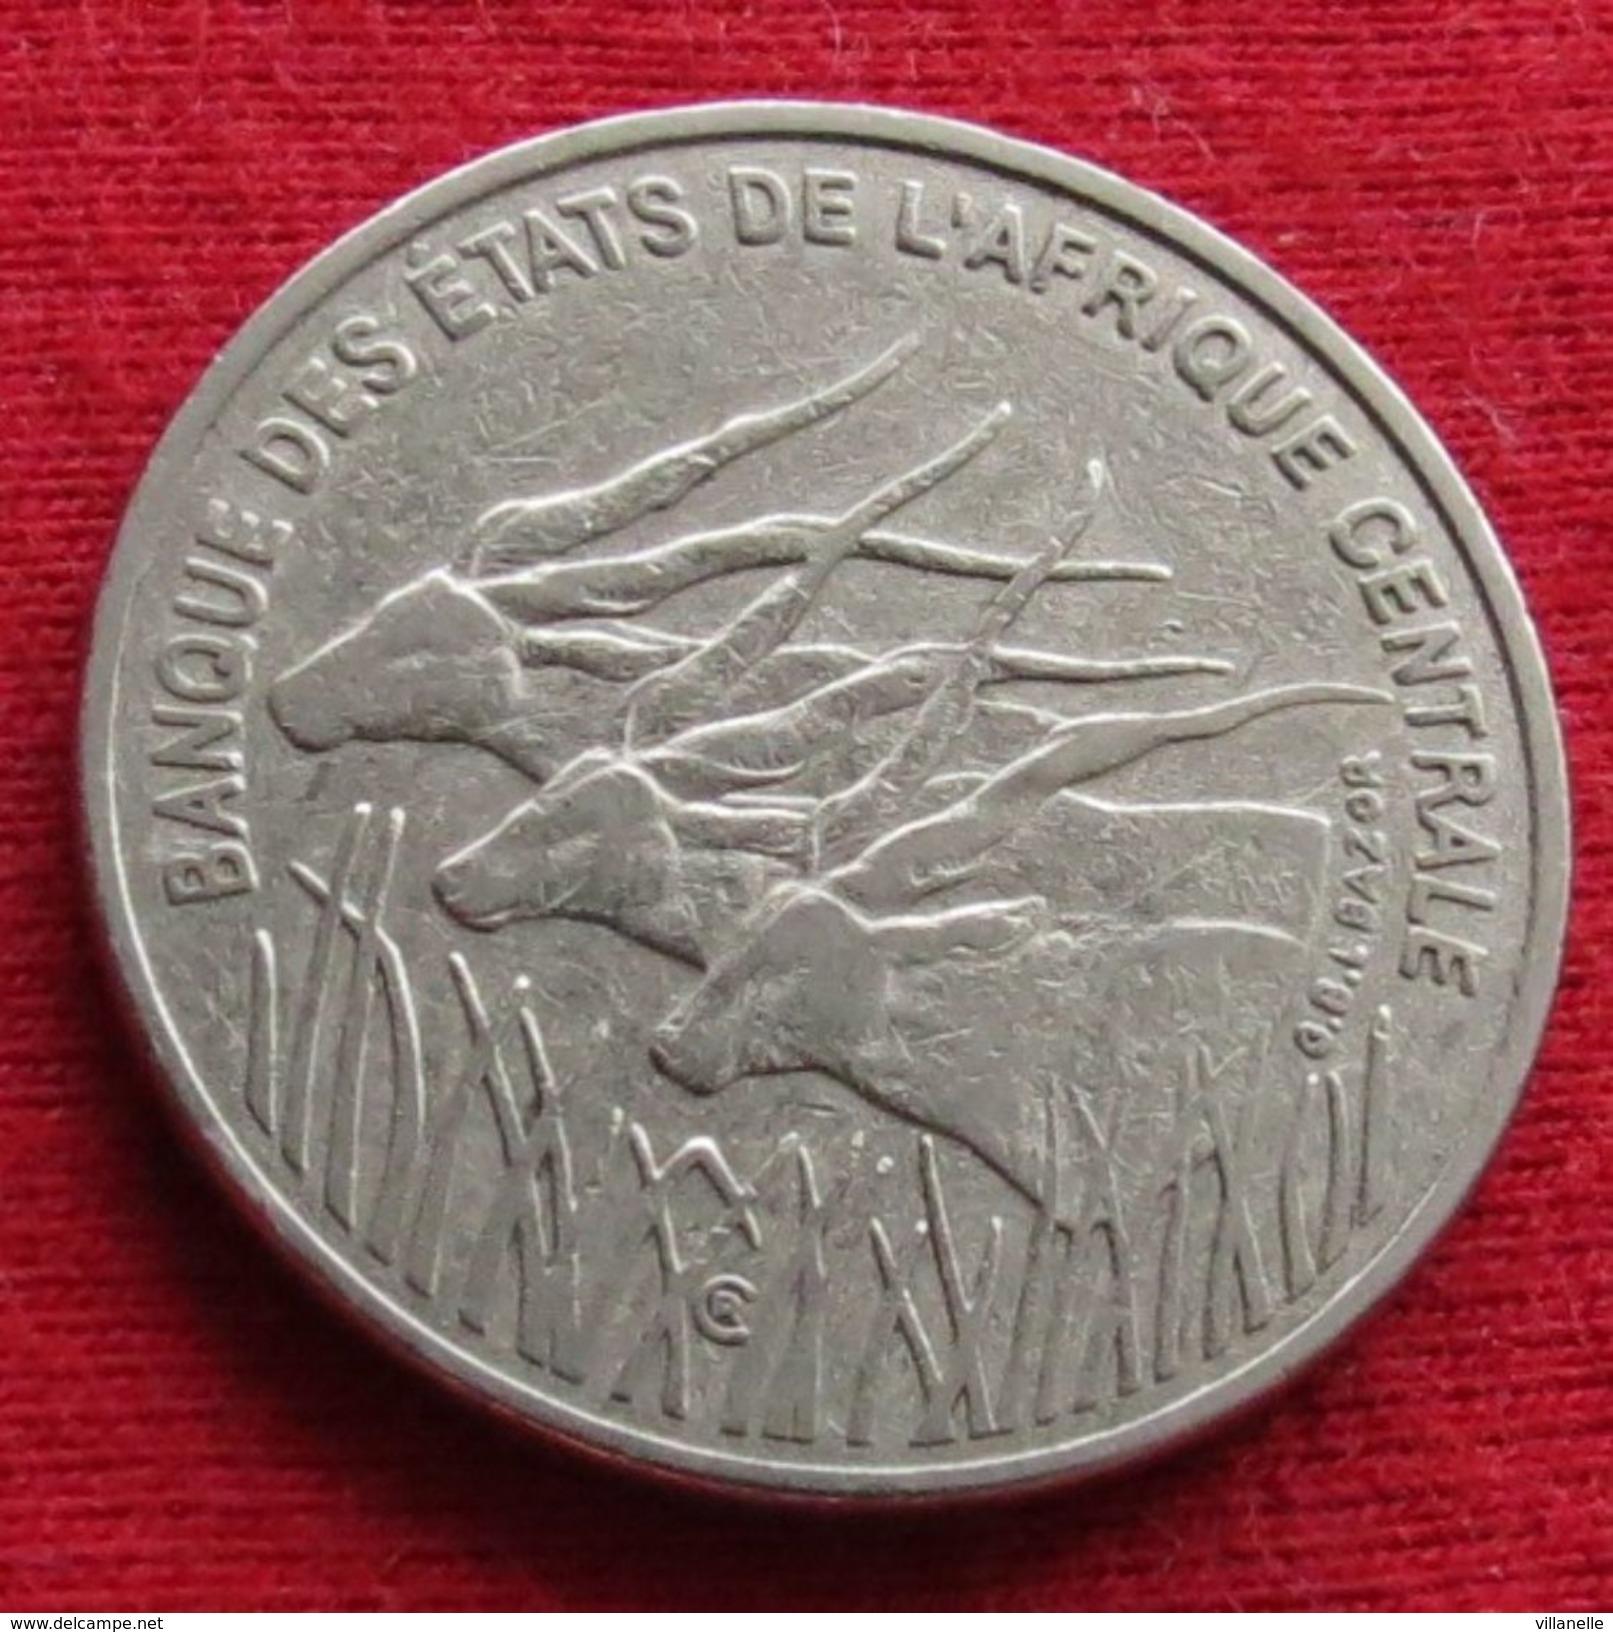 Central African States 100 Francs 1998 KM# 13 Lt 326 Africa Afrika Afrique - Monnaies